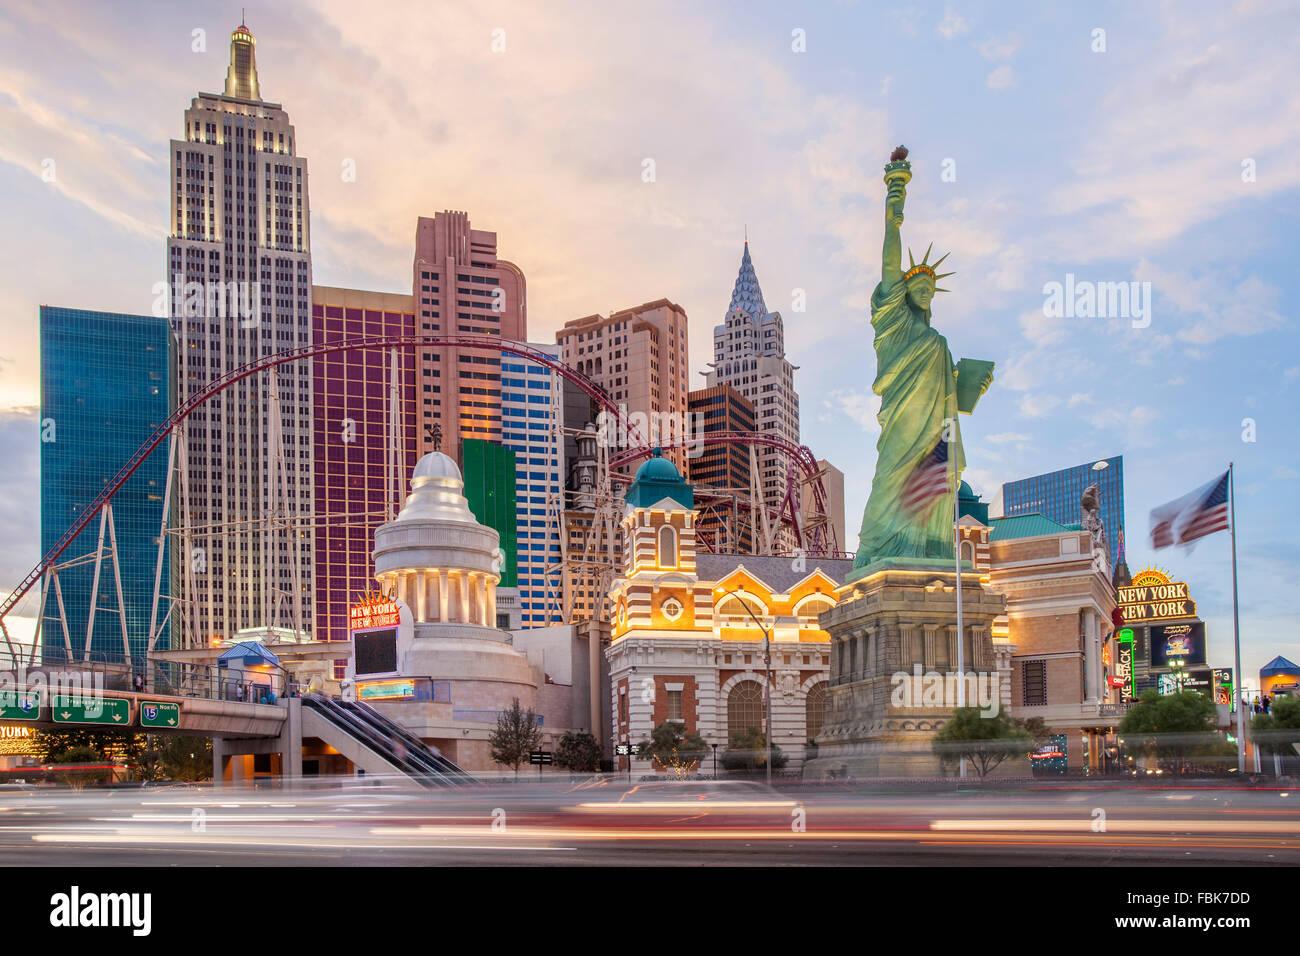 Abend in das New York New York Hotel und Casino, Las Vegas Stockbild